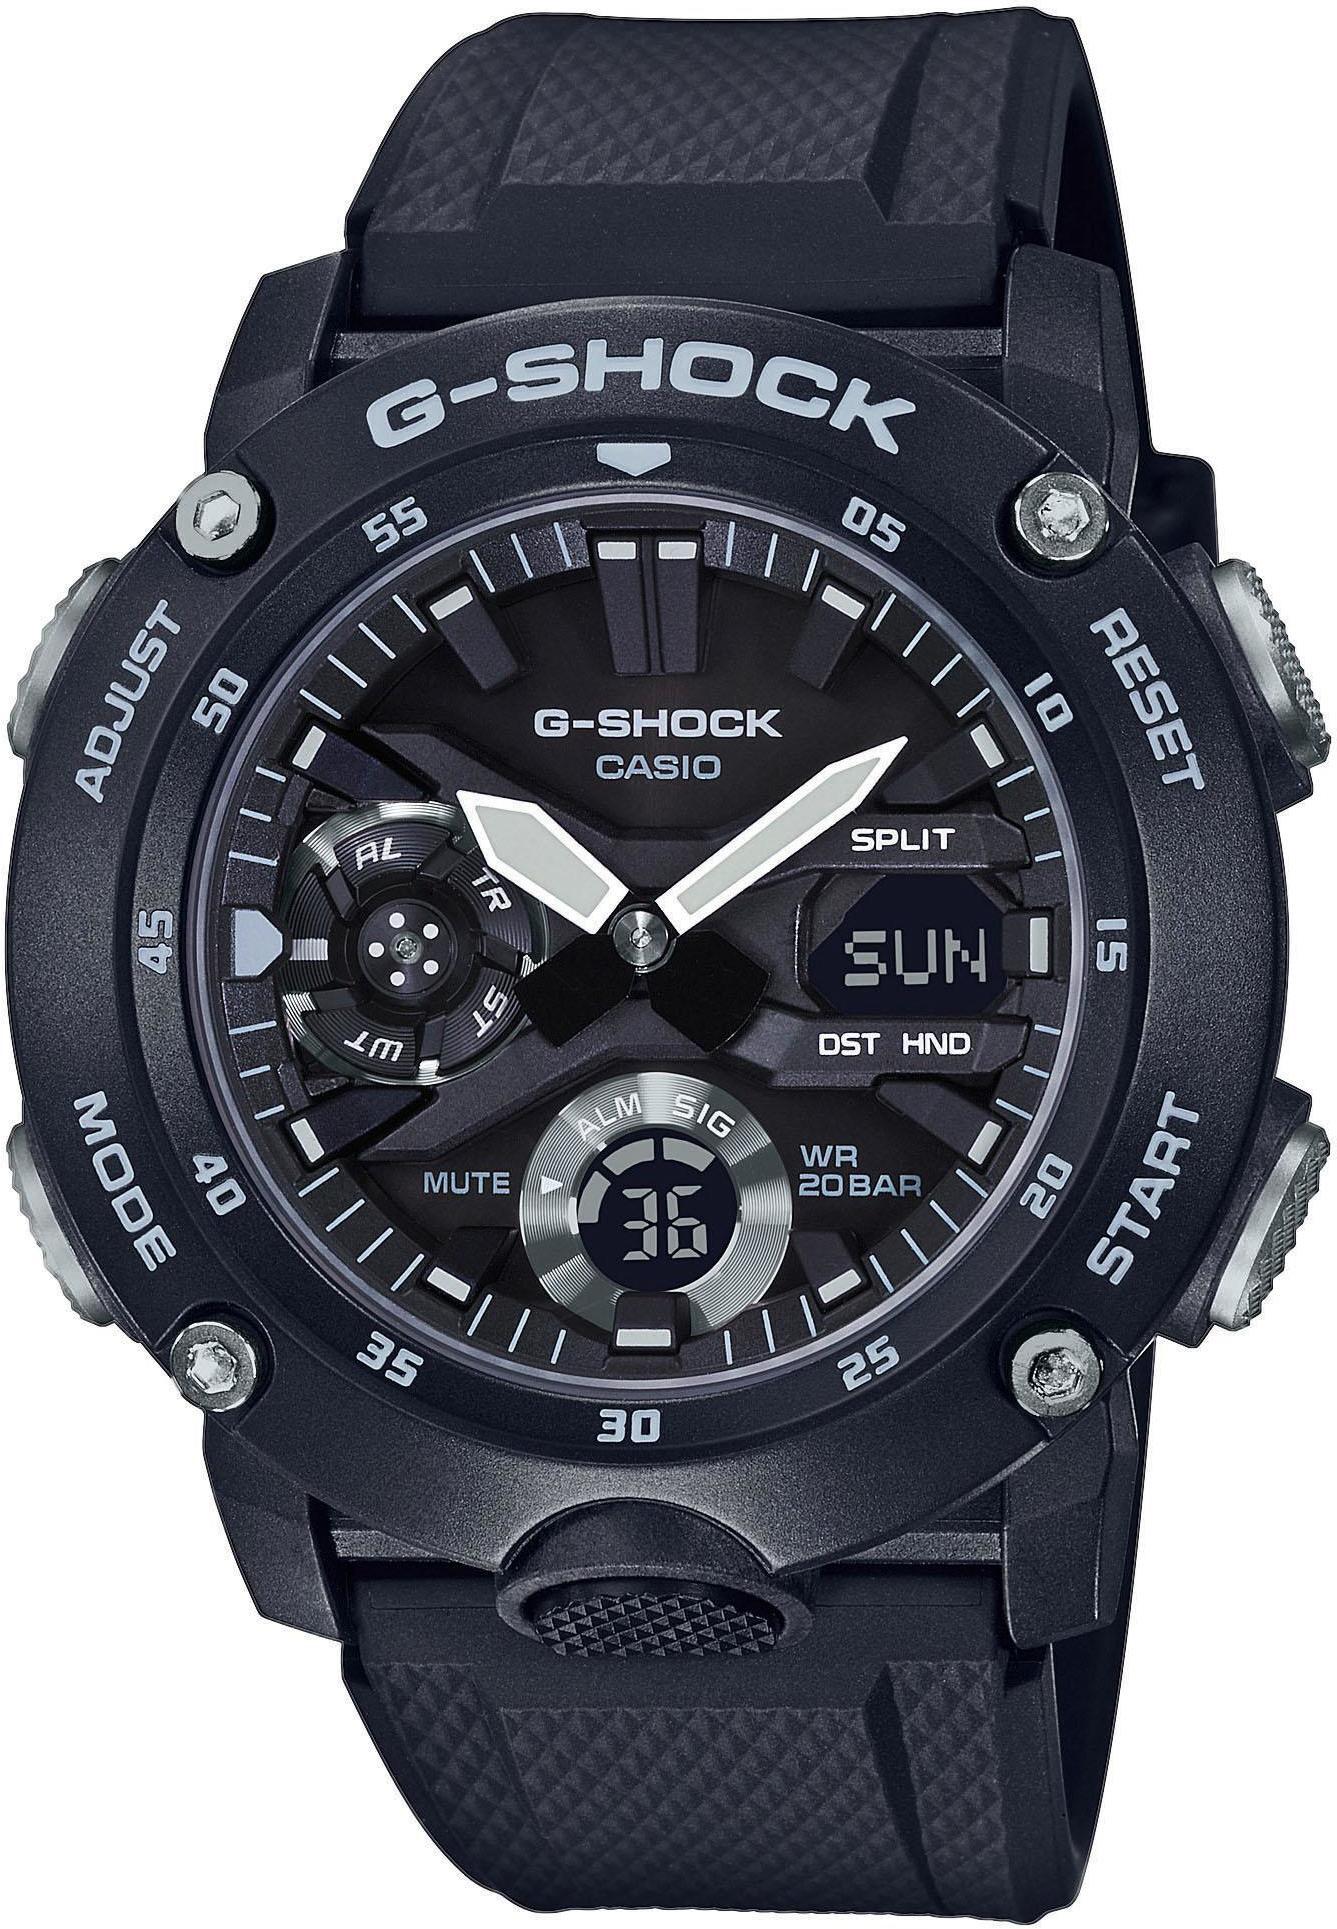 CASIO G-SHOCK Classic GA-2000S-1AER Ur Herrer, black (2019)   Sports watches